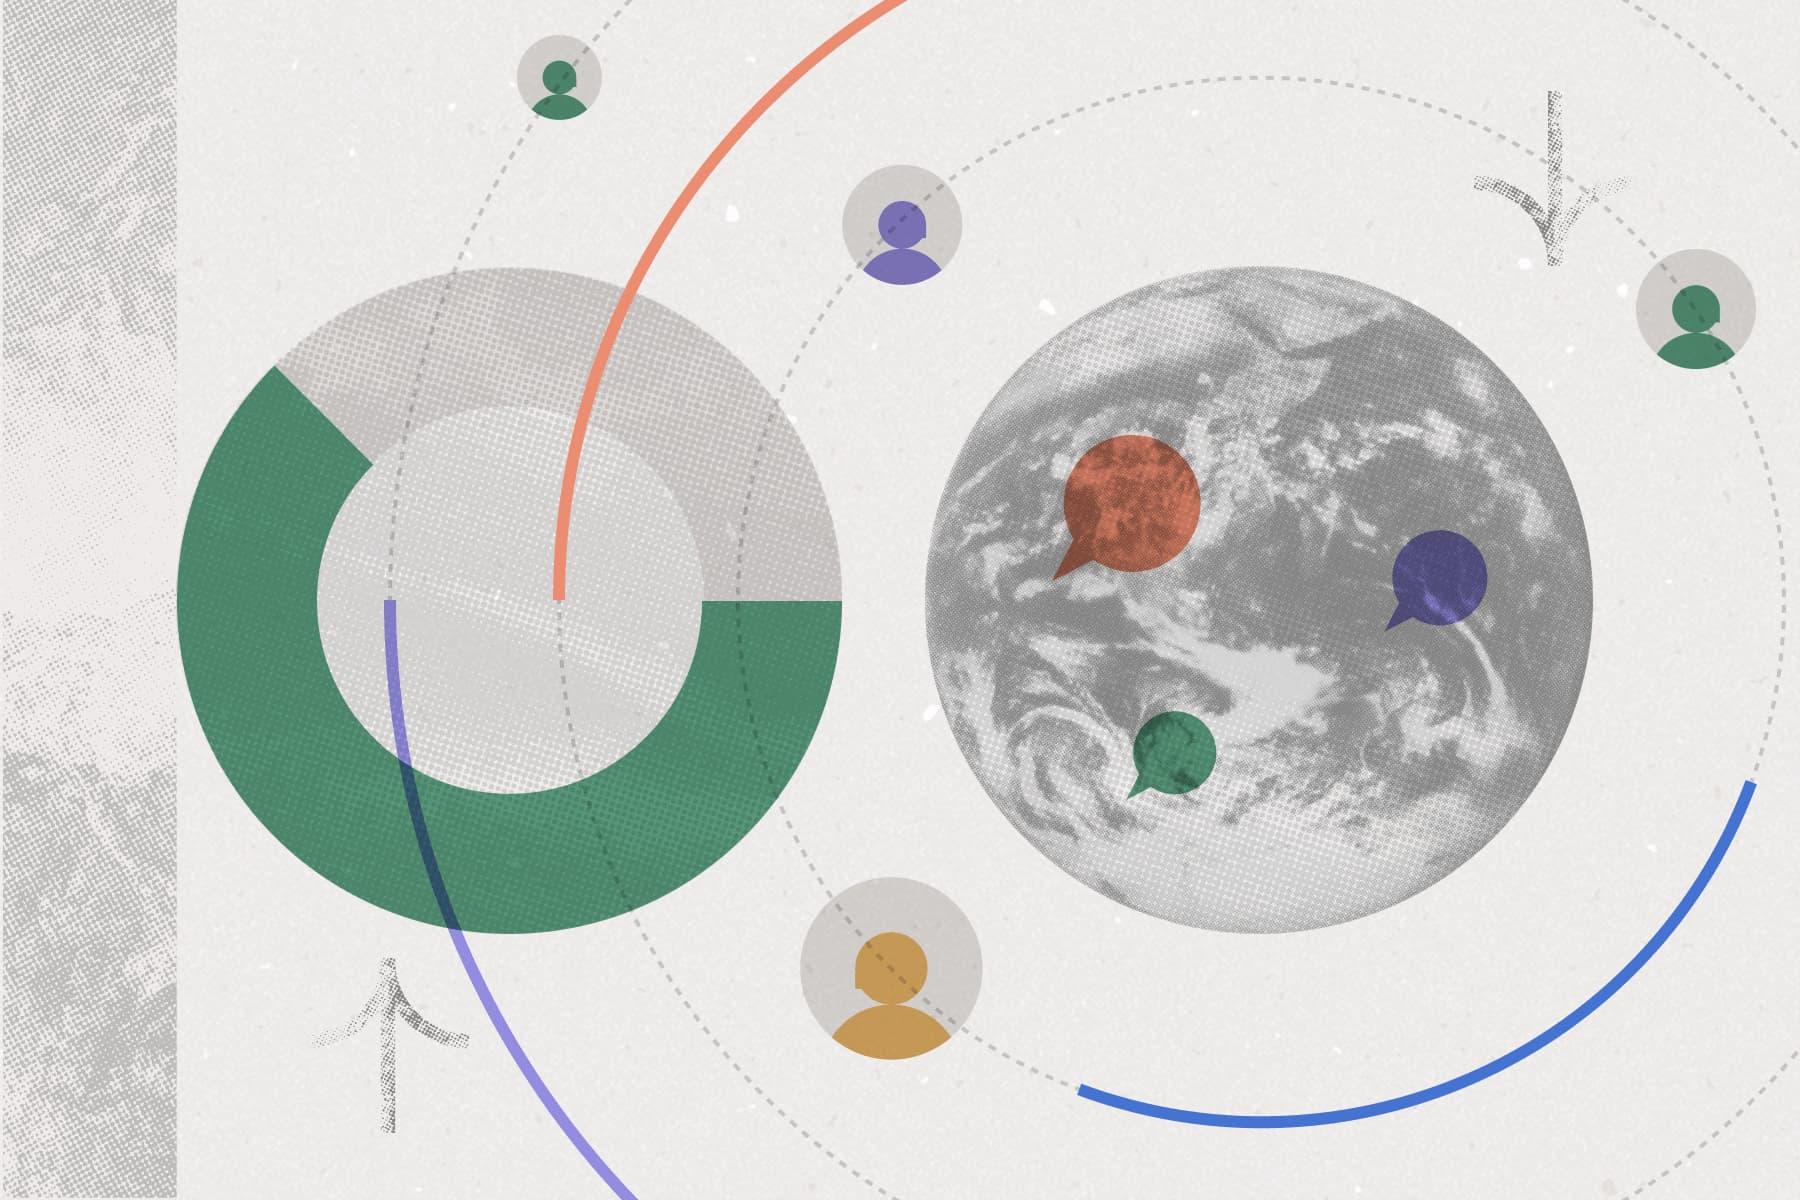 Anatomy of work remote teams survey article banner image